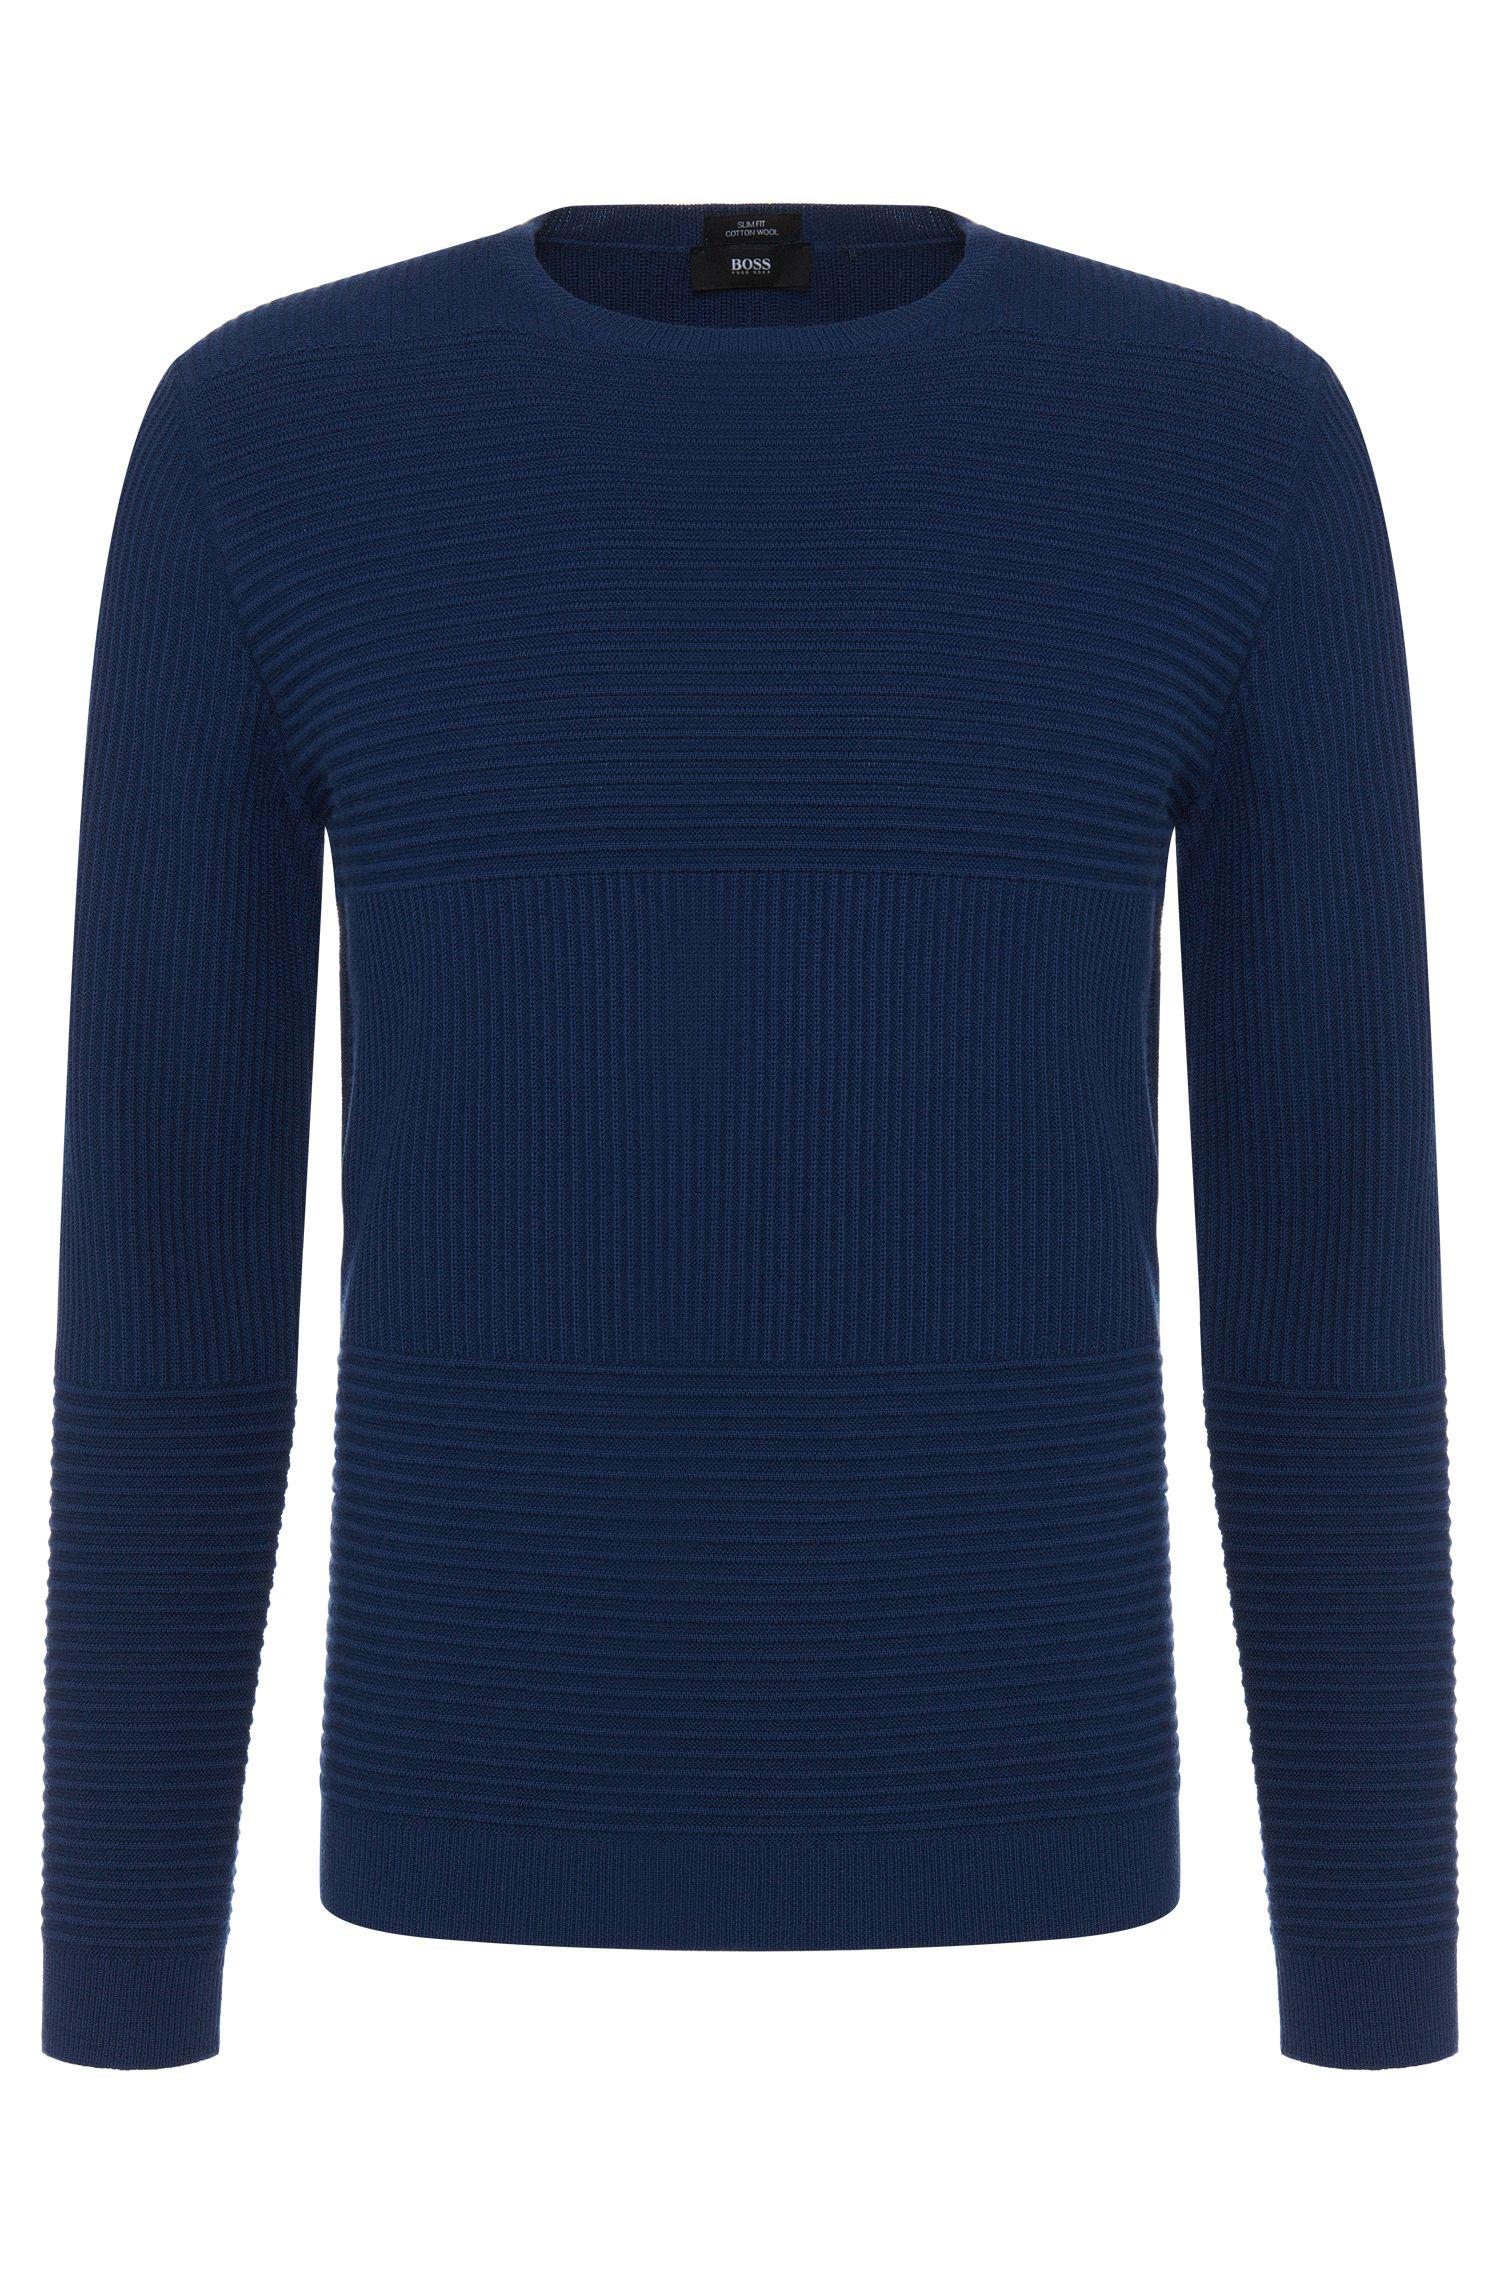 'Banty' | Virgin Wool Cotton Ribbed Panel Sweater